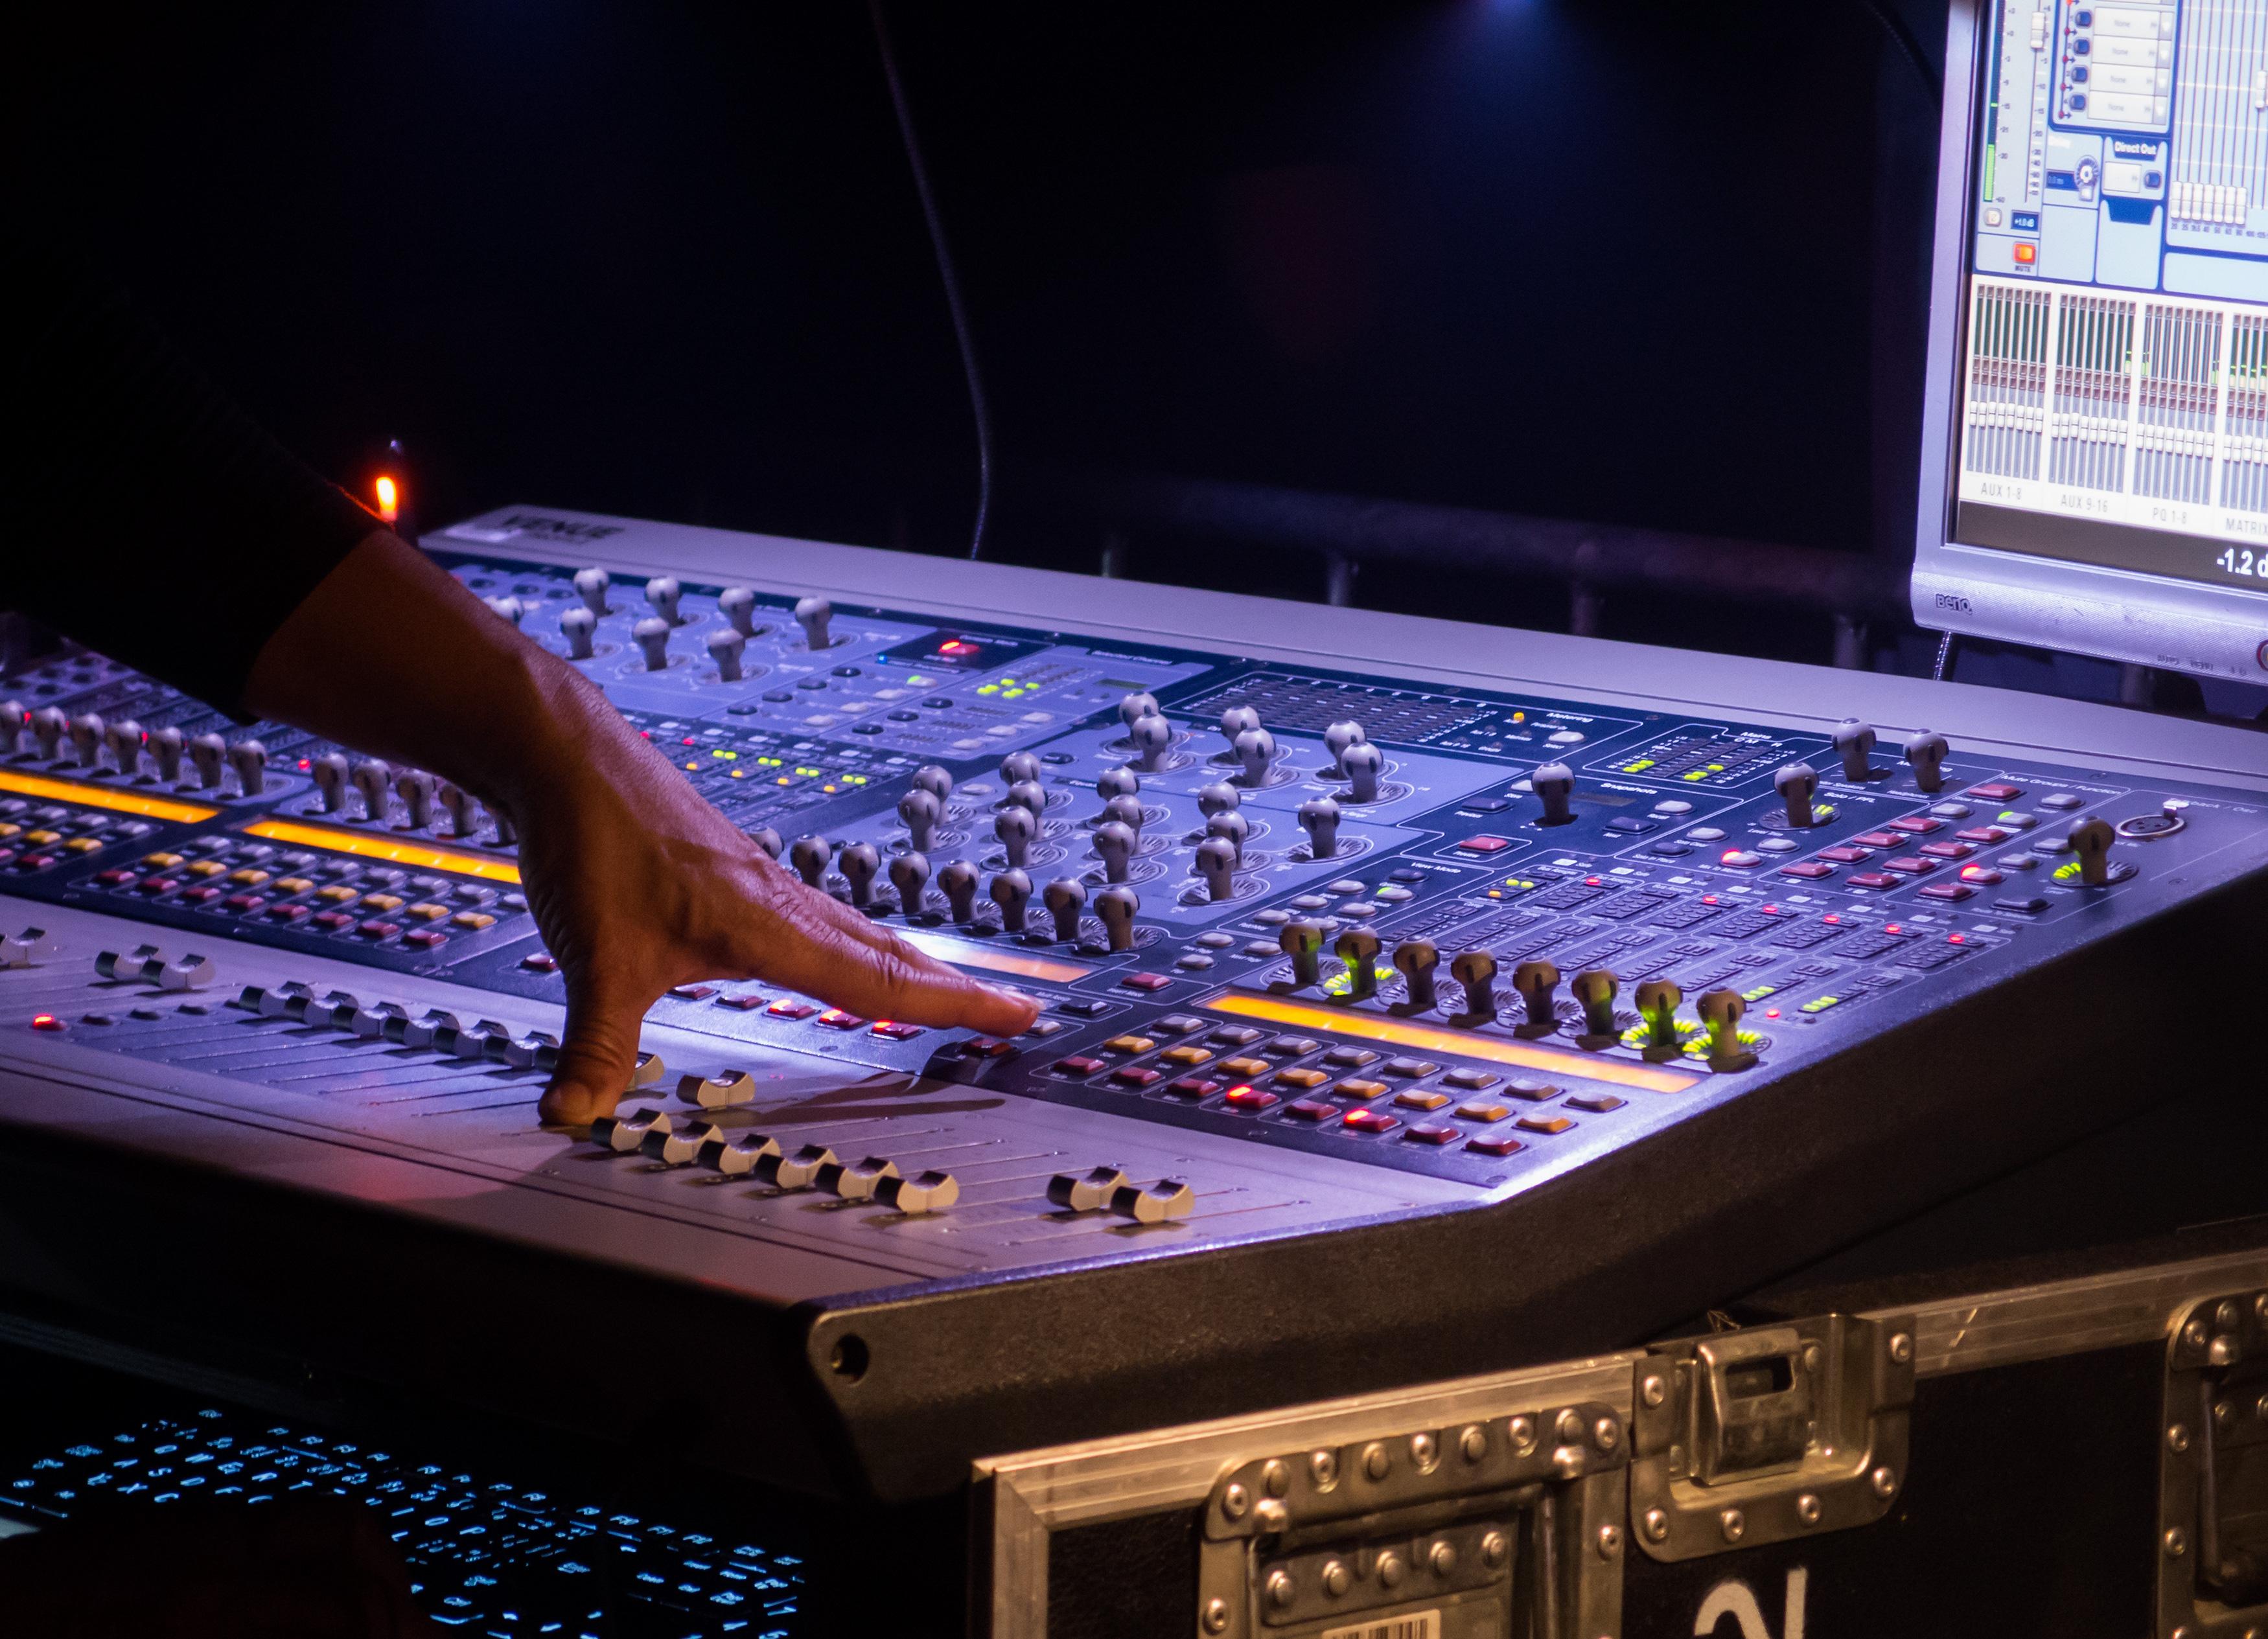 FREE IMAGE: Soundman With a Mixer At Concert - Libreshot ...